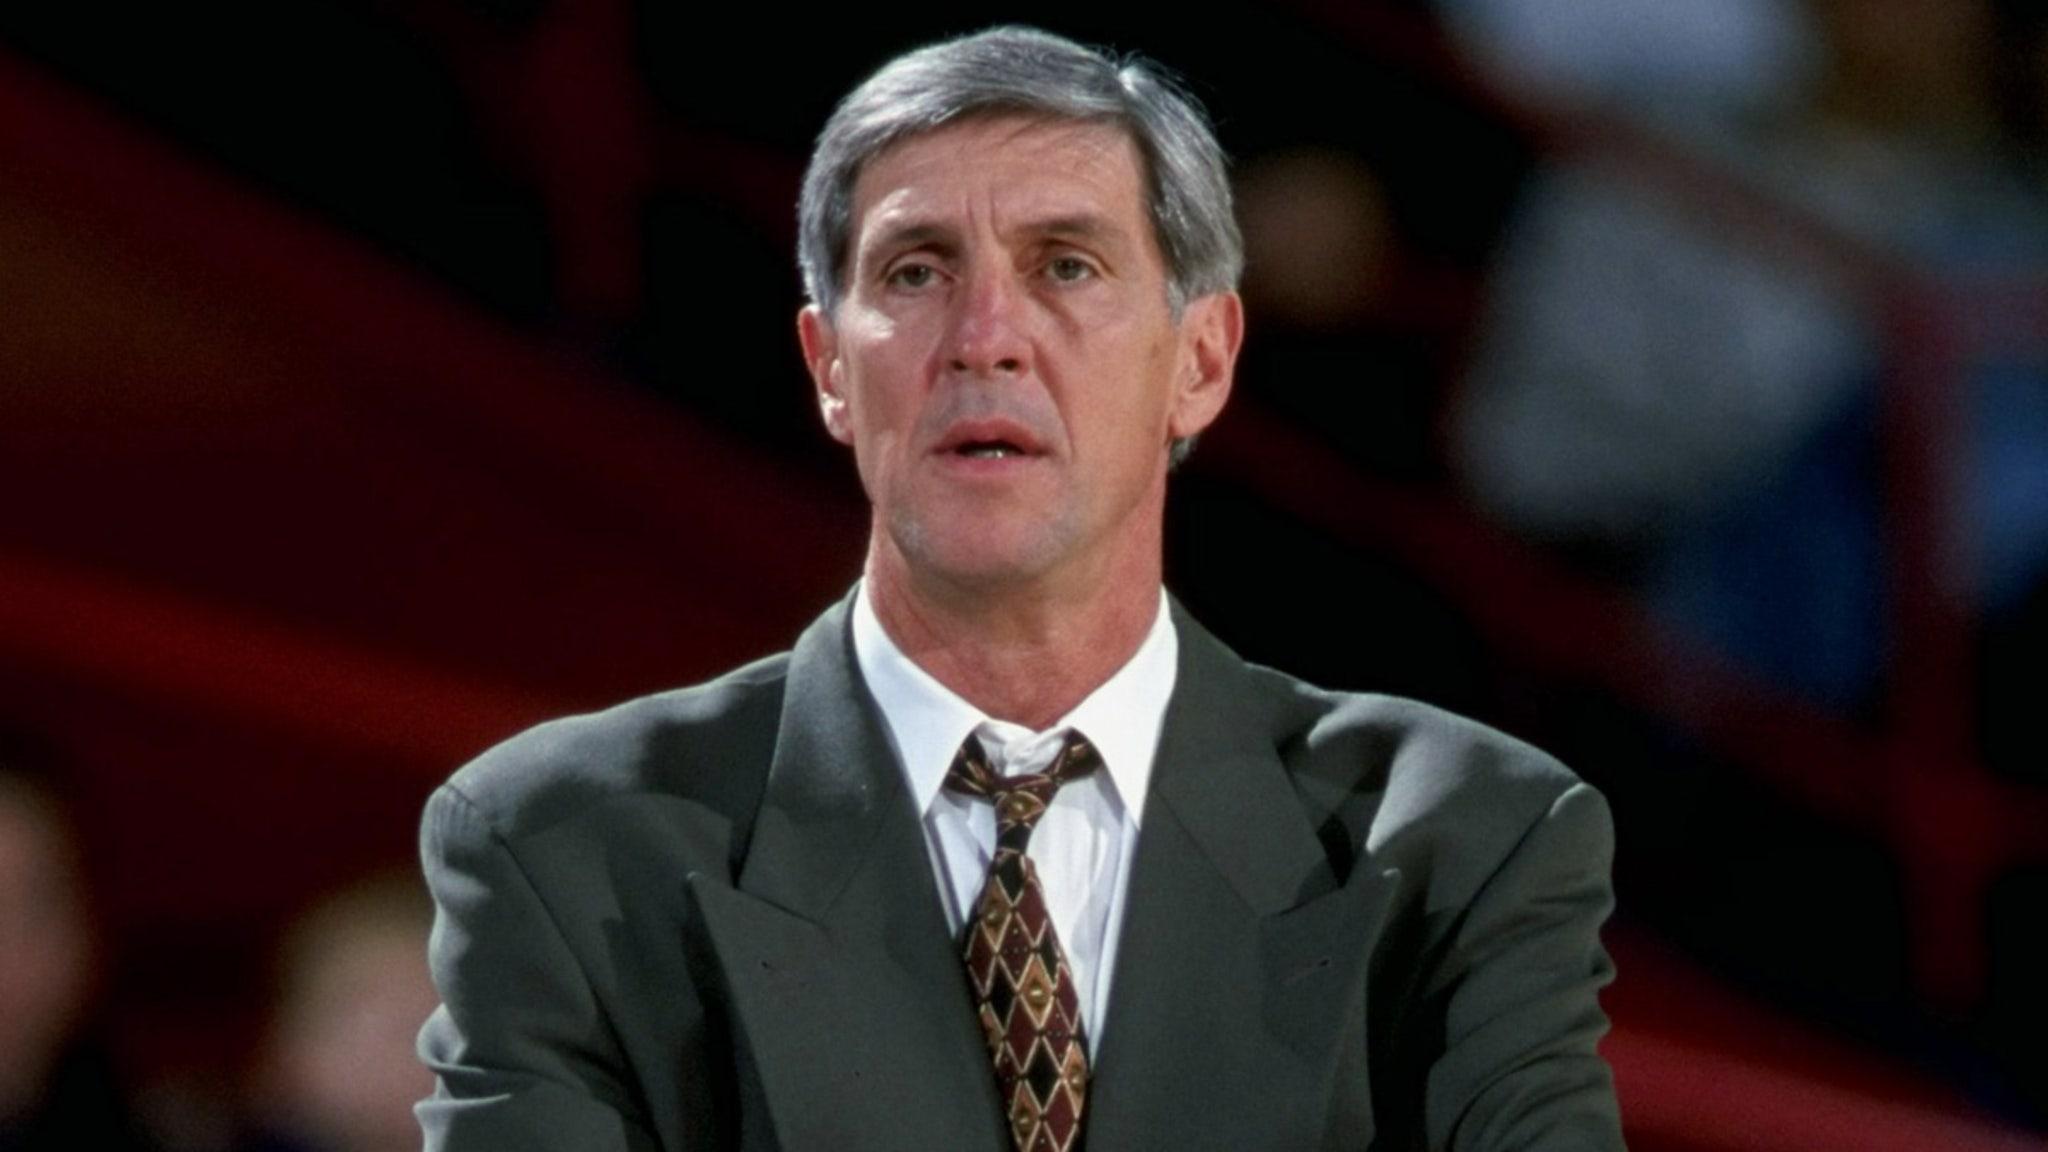 Jerry Sloan, Legendary NBA Utah Jazz Coach, Dead at 78